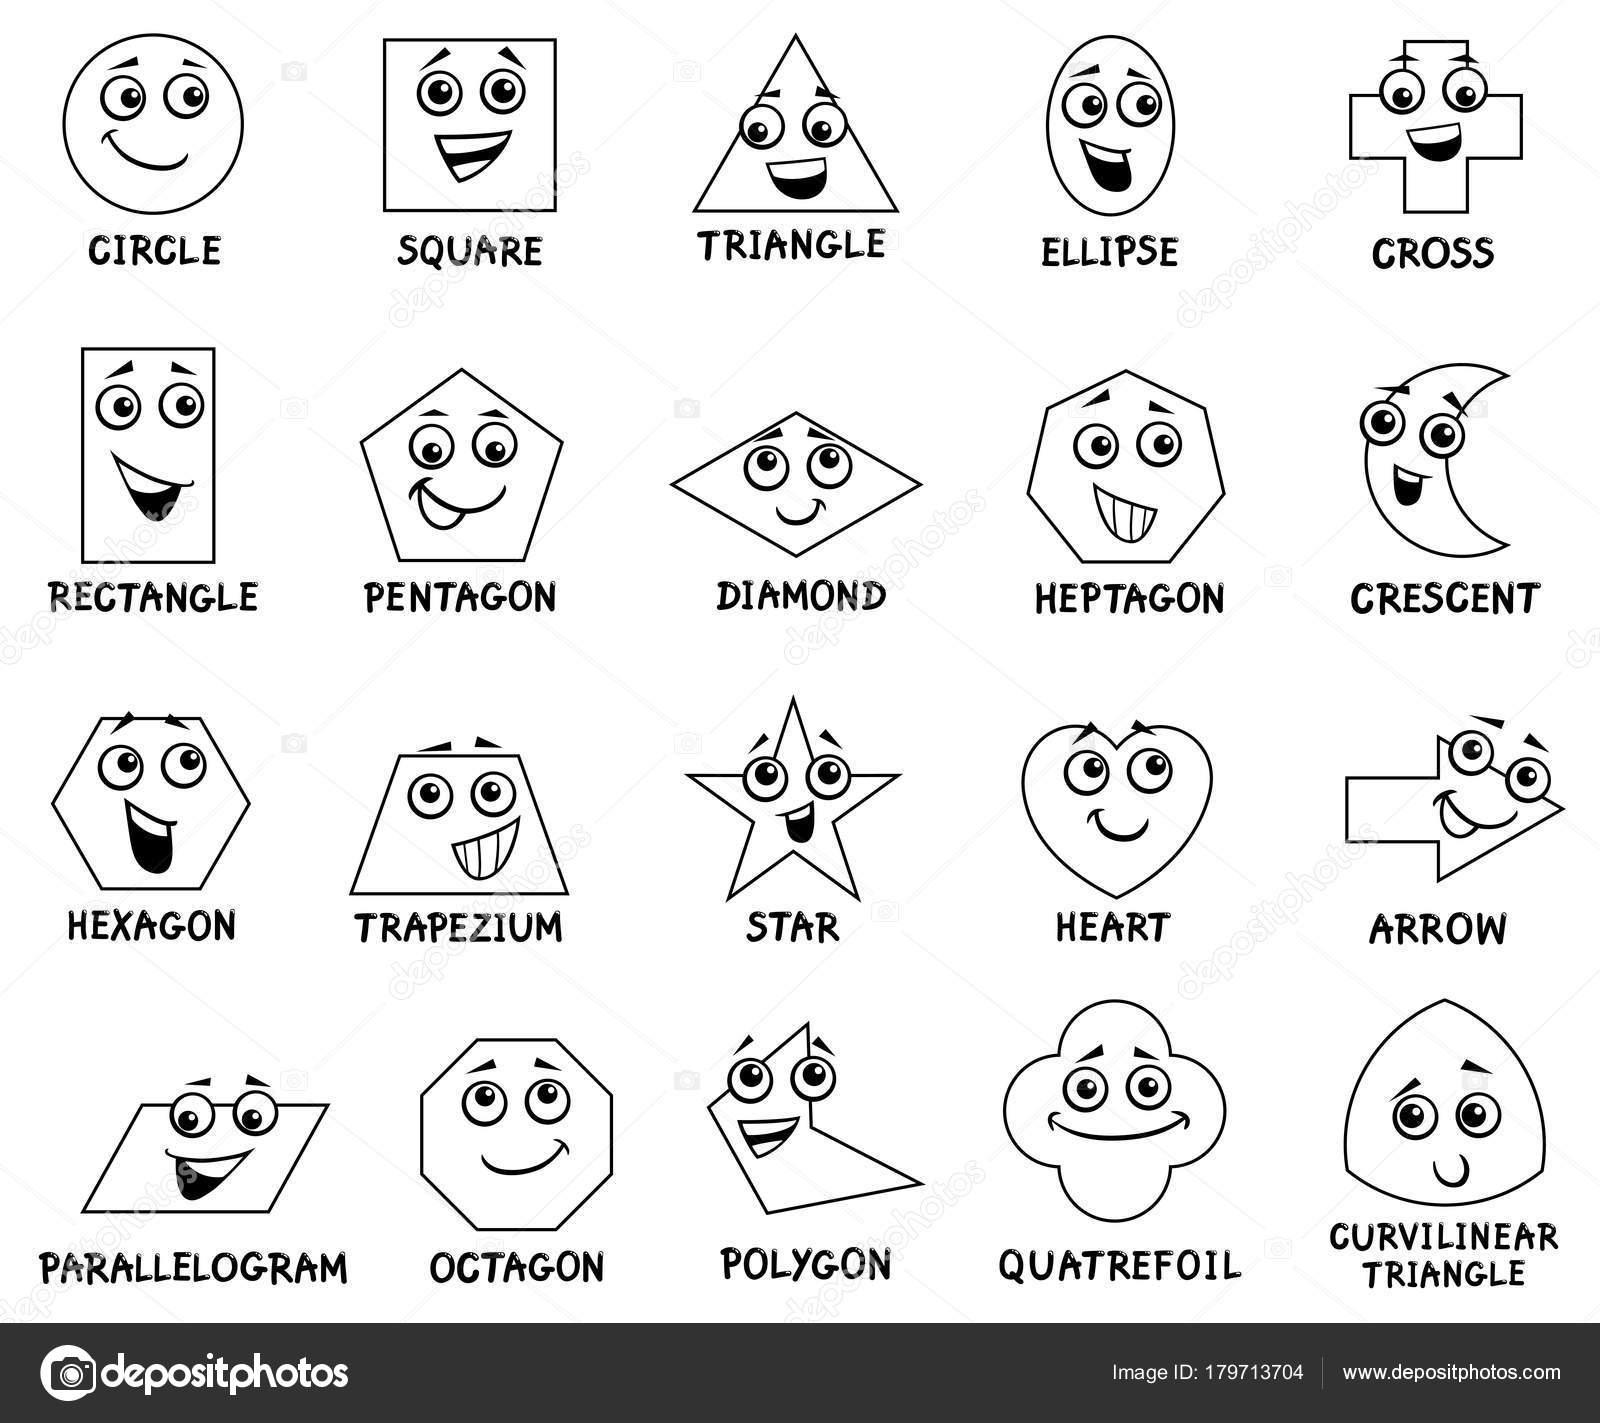 Personajes De Dibujos Animados Figuras Geométricas Básicas